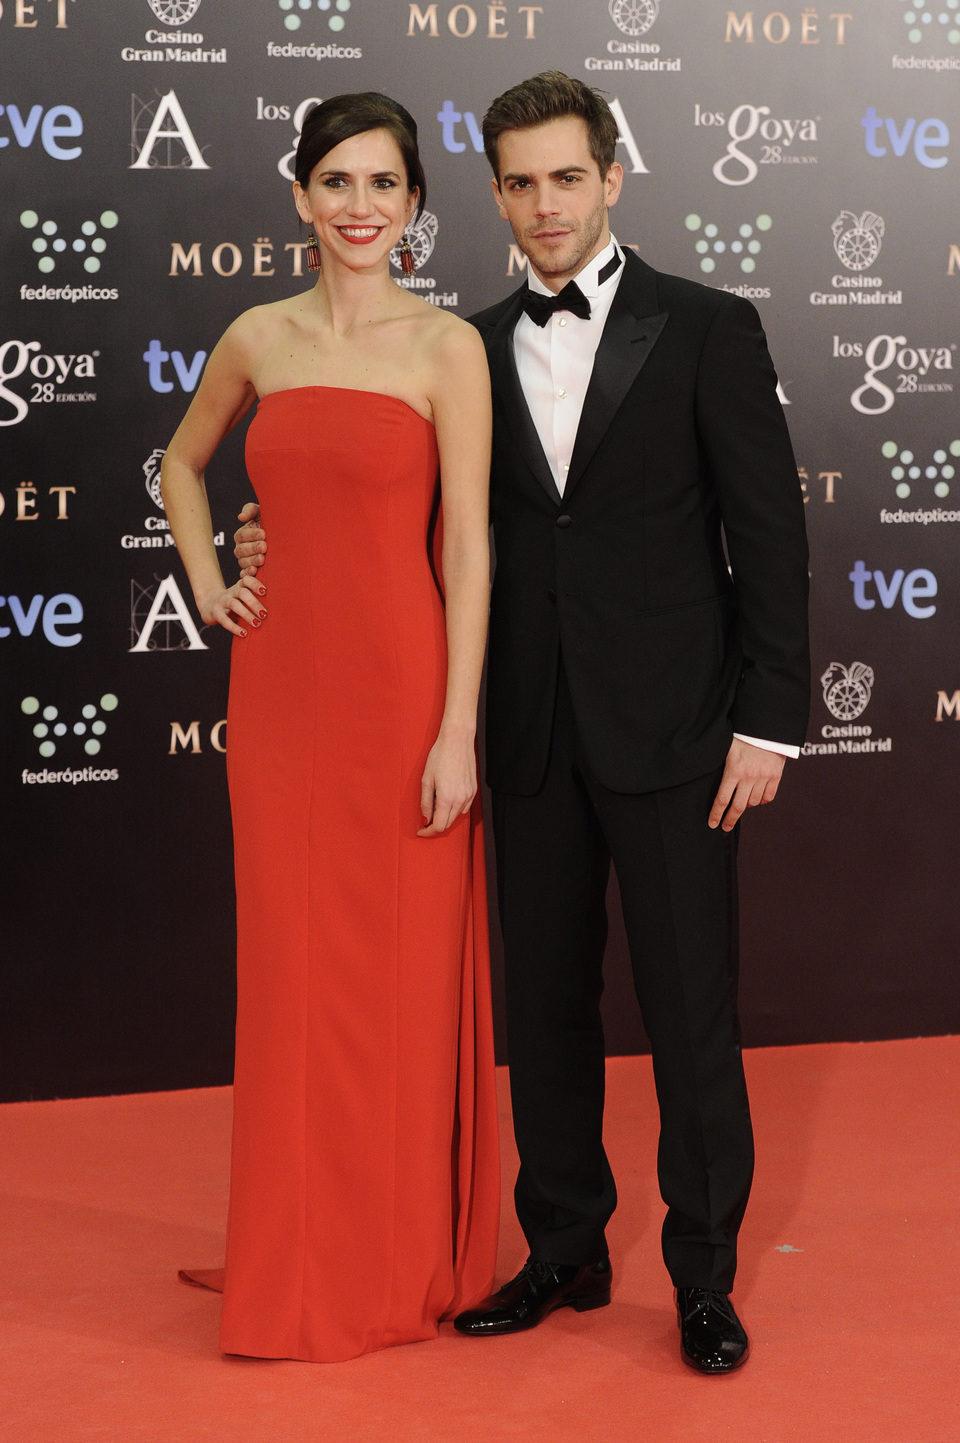 Aina Clotet y Marc Clotet en los Goya 2014